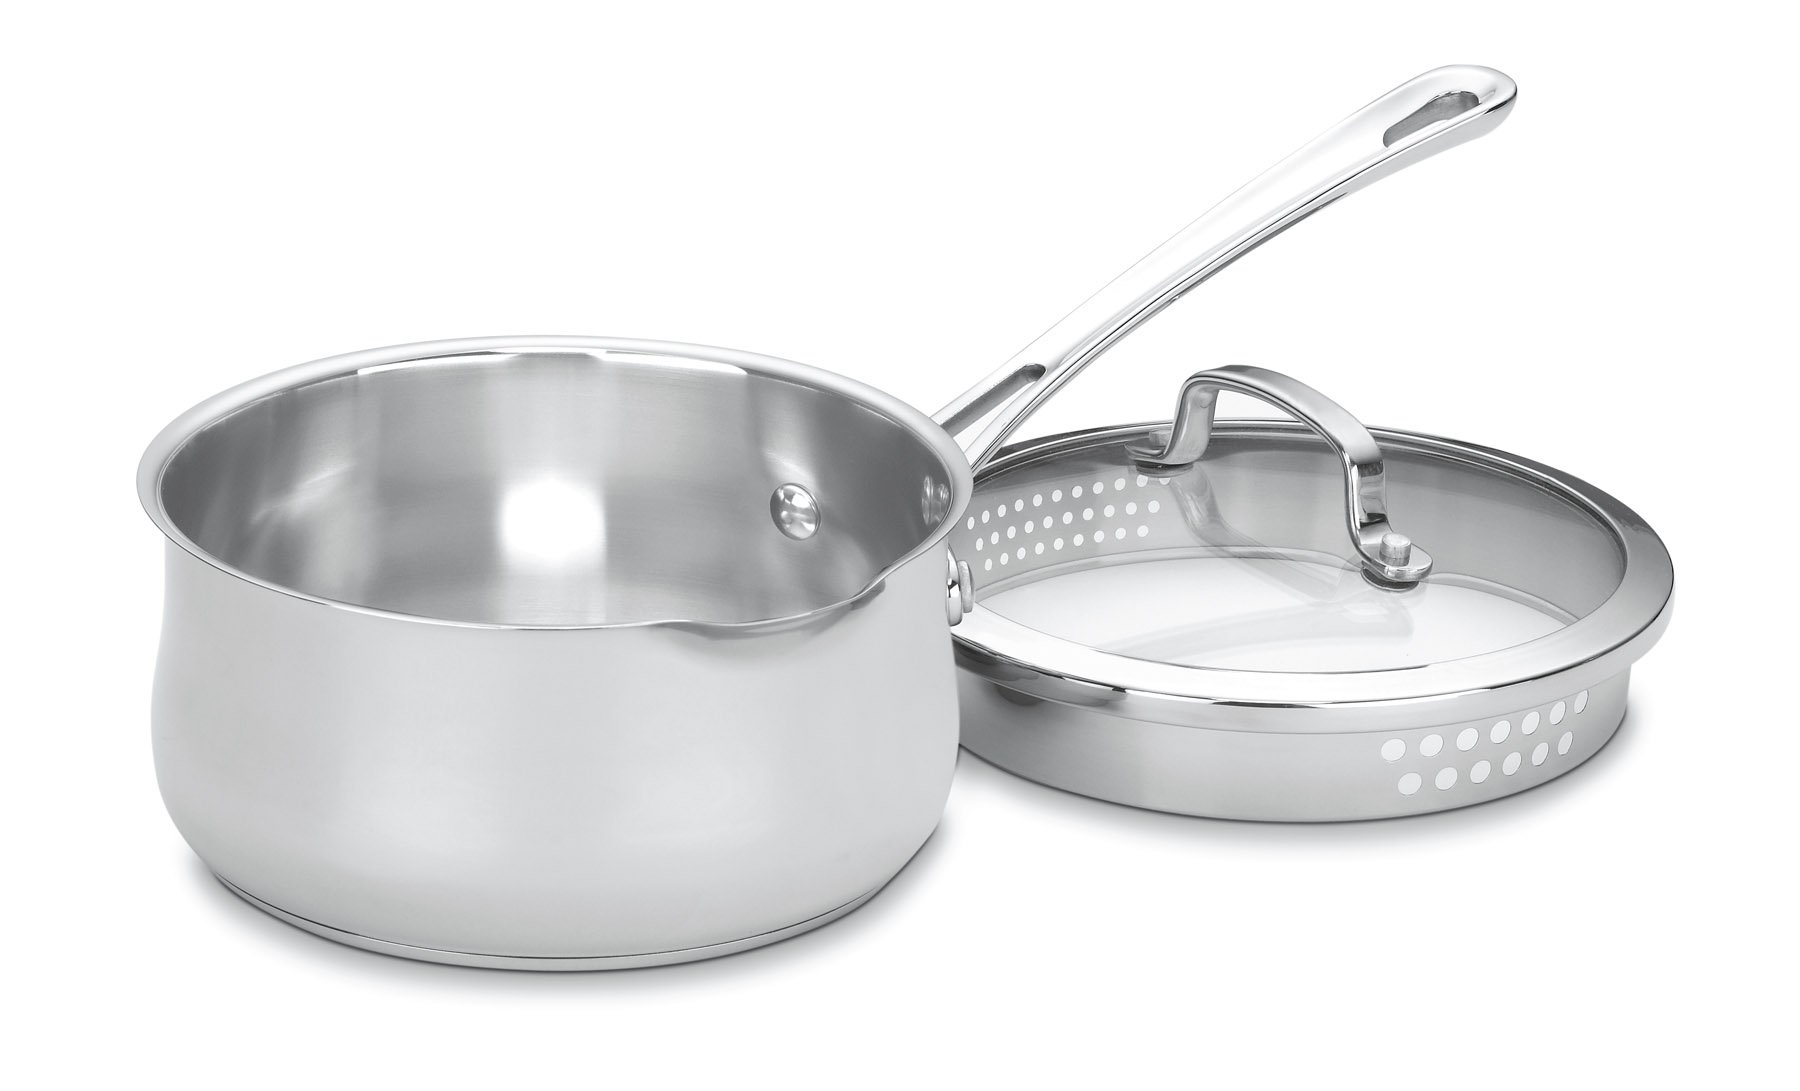 Cuisinart 419-18P Contour Stainless 2-Quart Pour Saucepan with Cover by Cuisinart